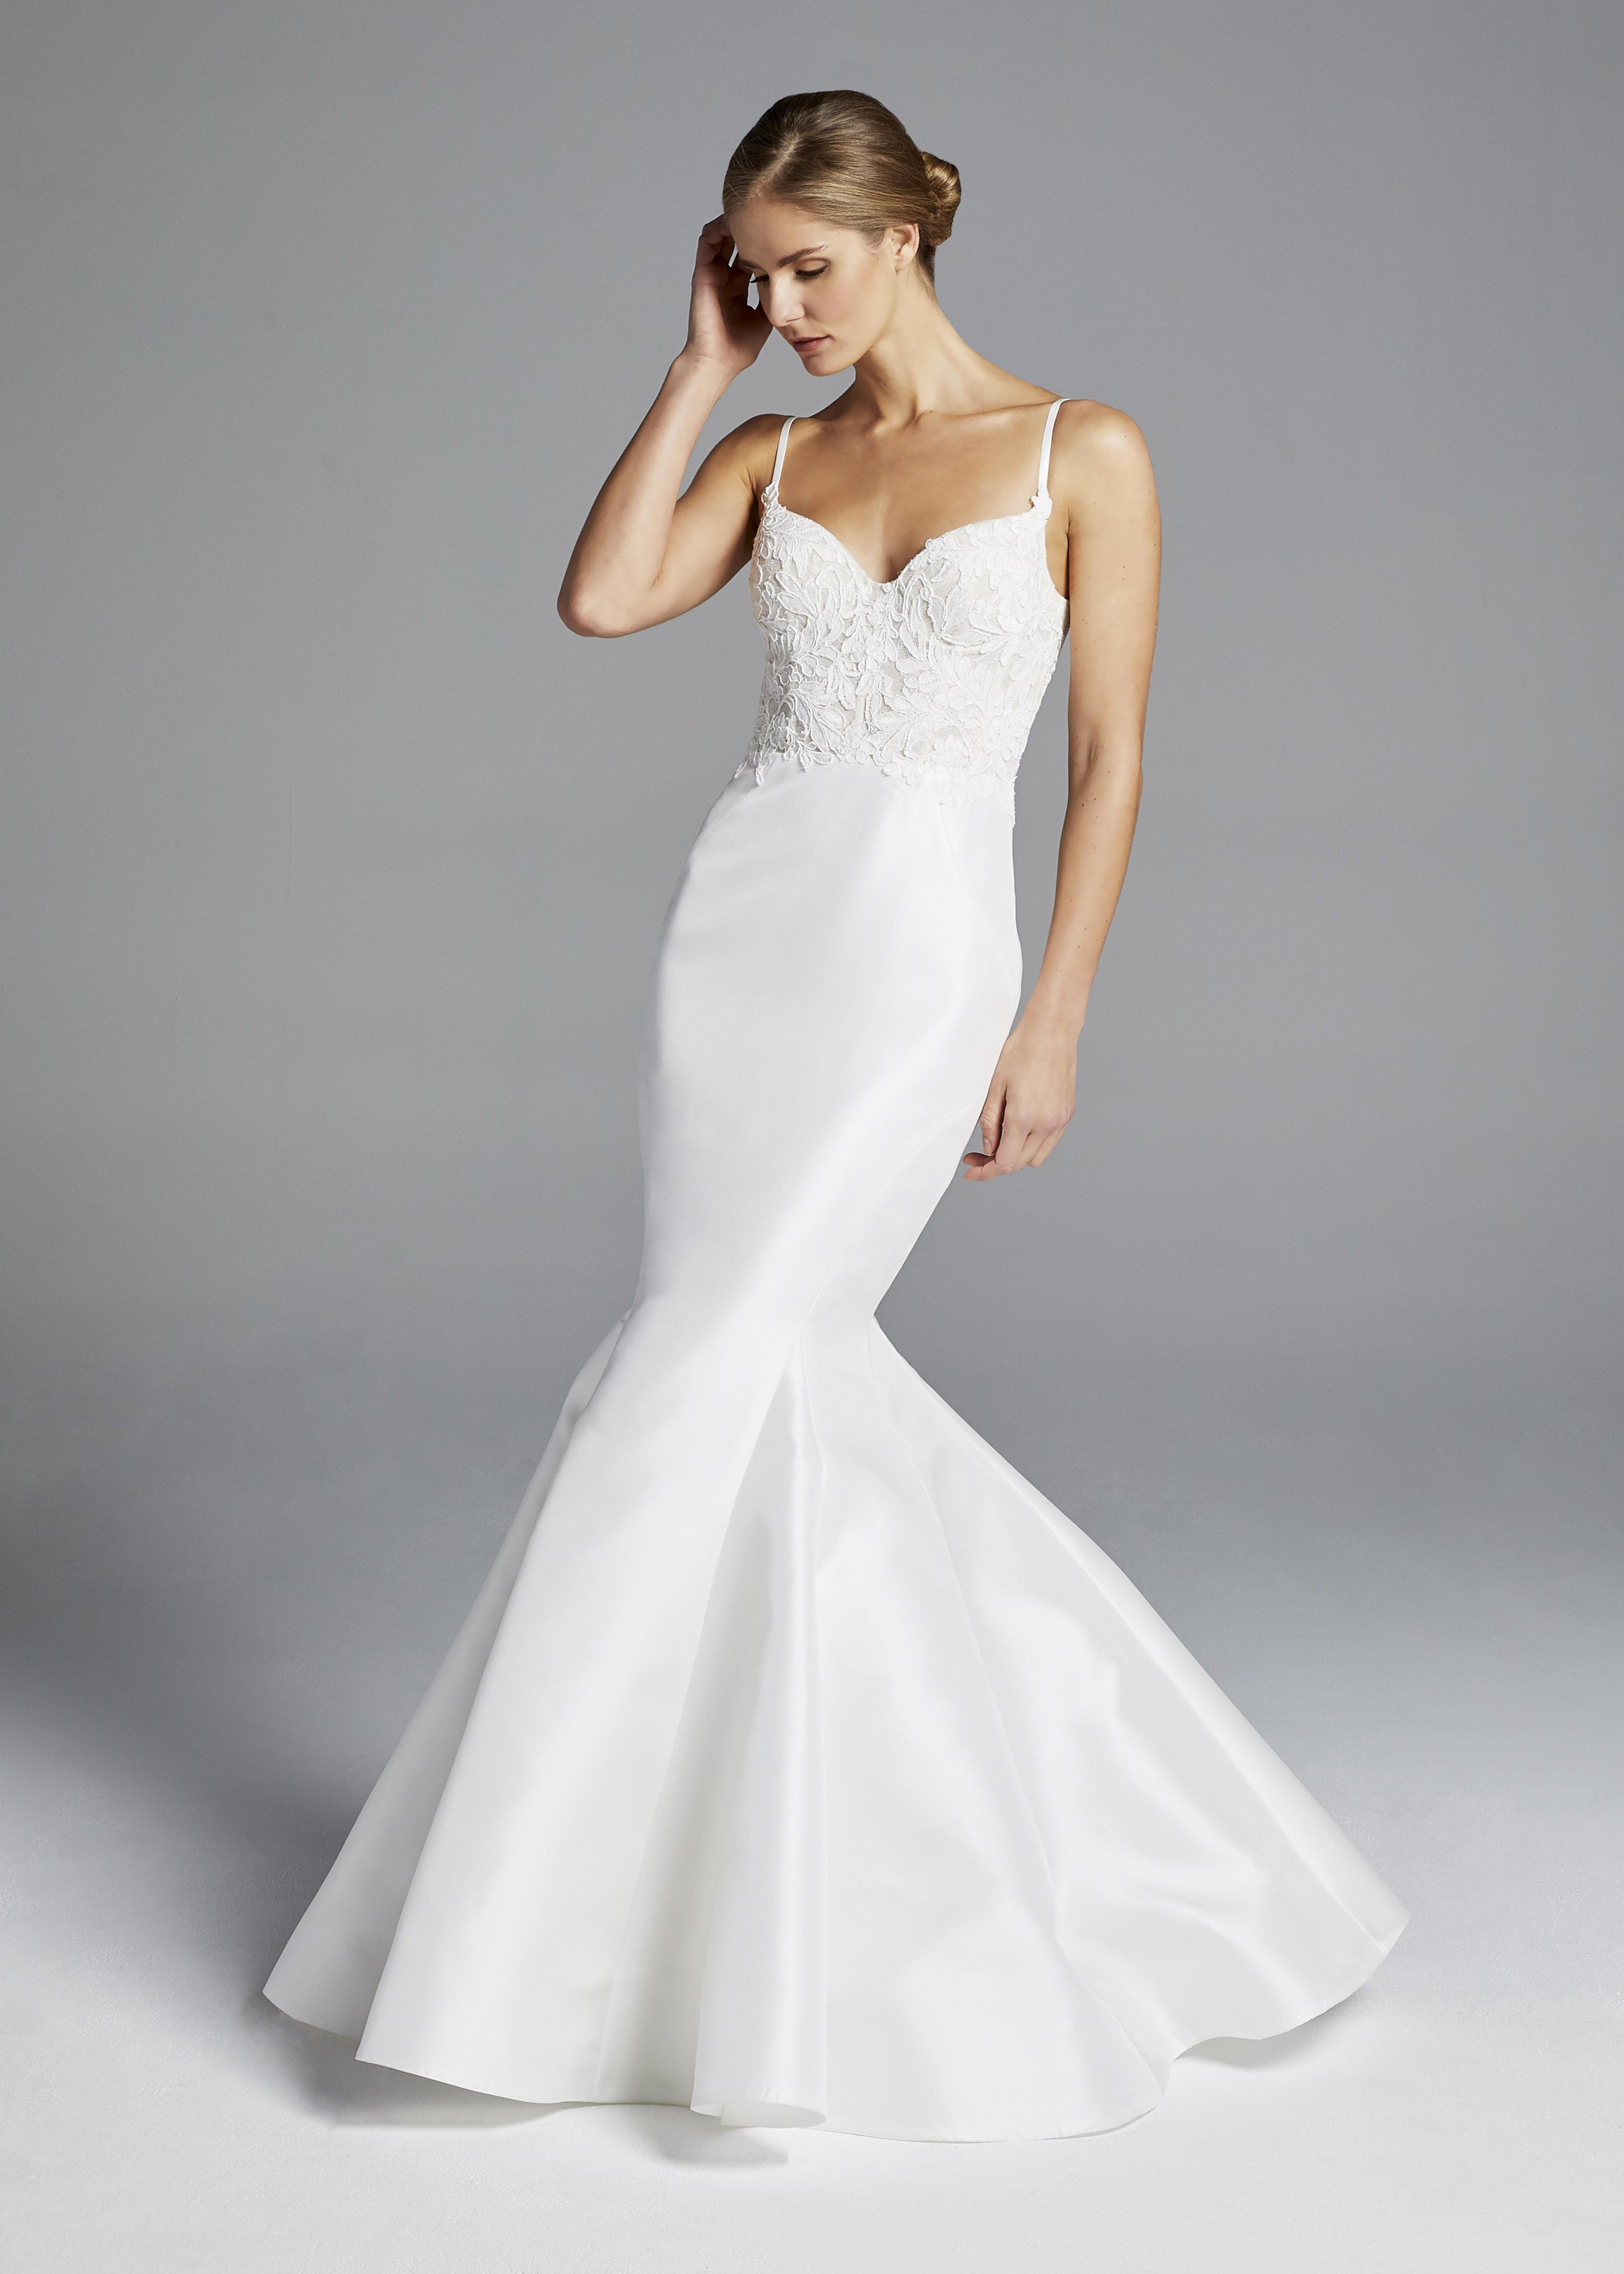 anne barge patterned spaghetti strap mermaid wedding dress spring 2019